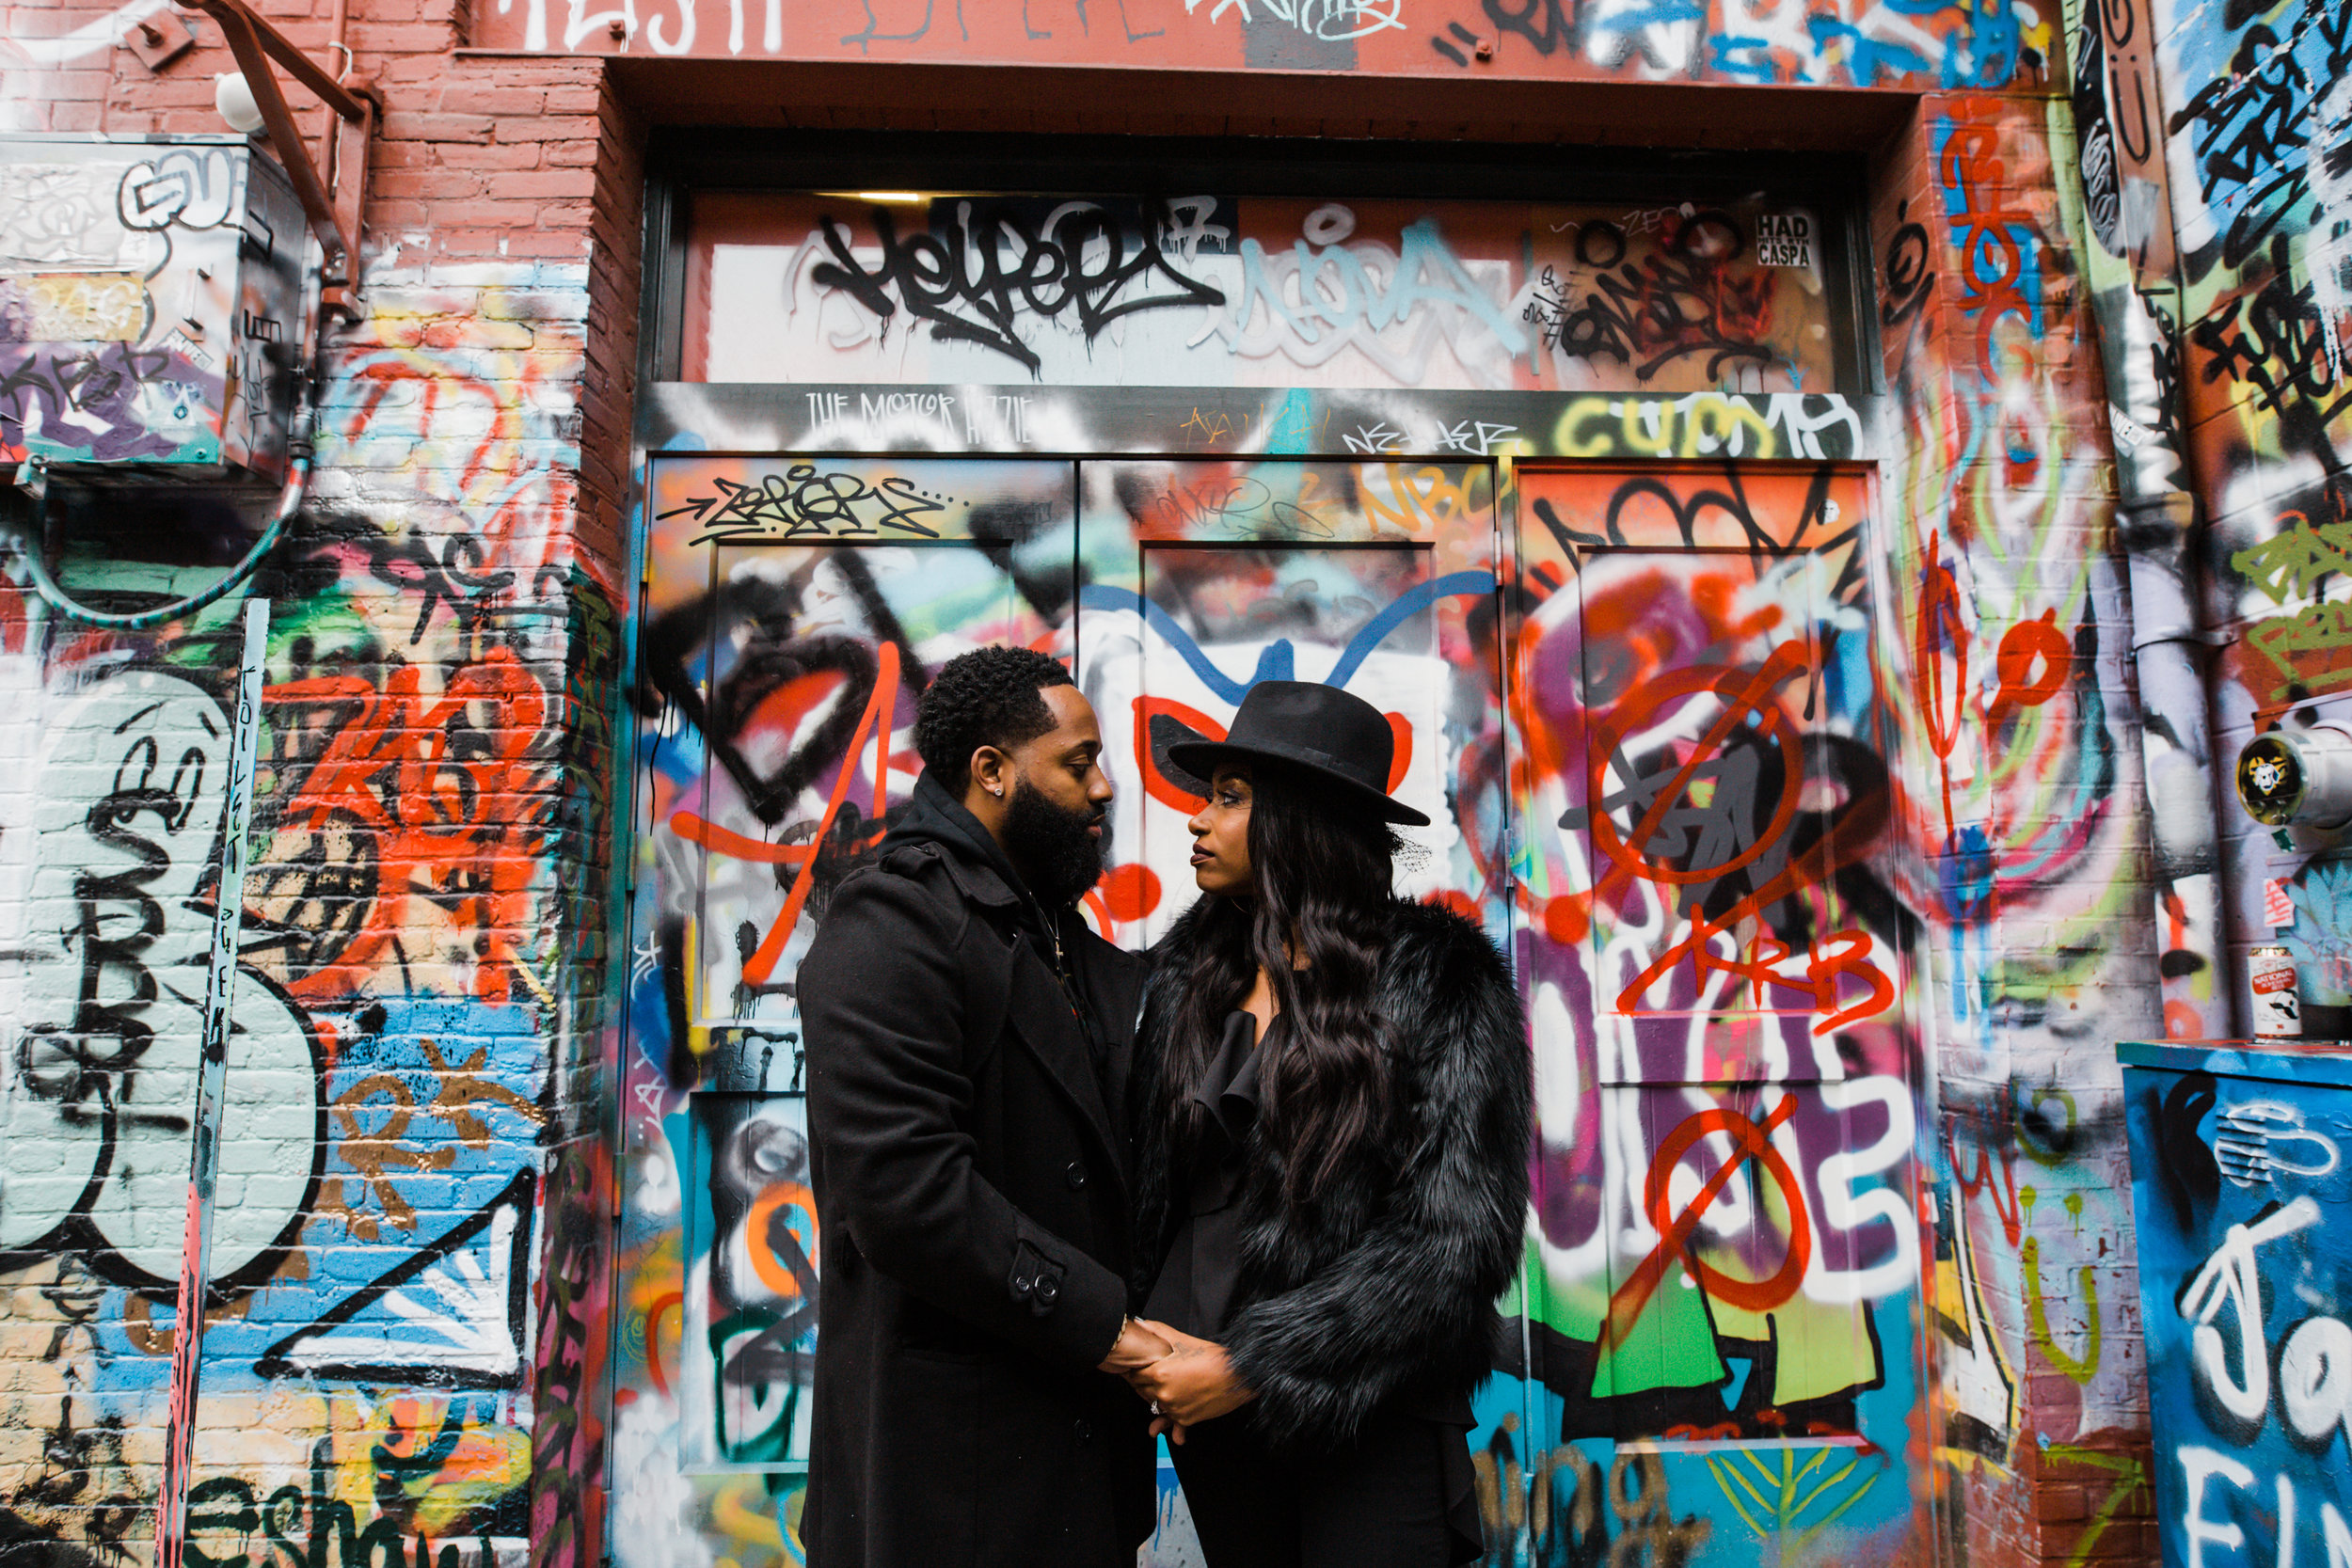 Creative Baltimore Graffiti Alley Engagement Session Megapixels Media Photography-15.jpg